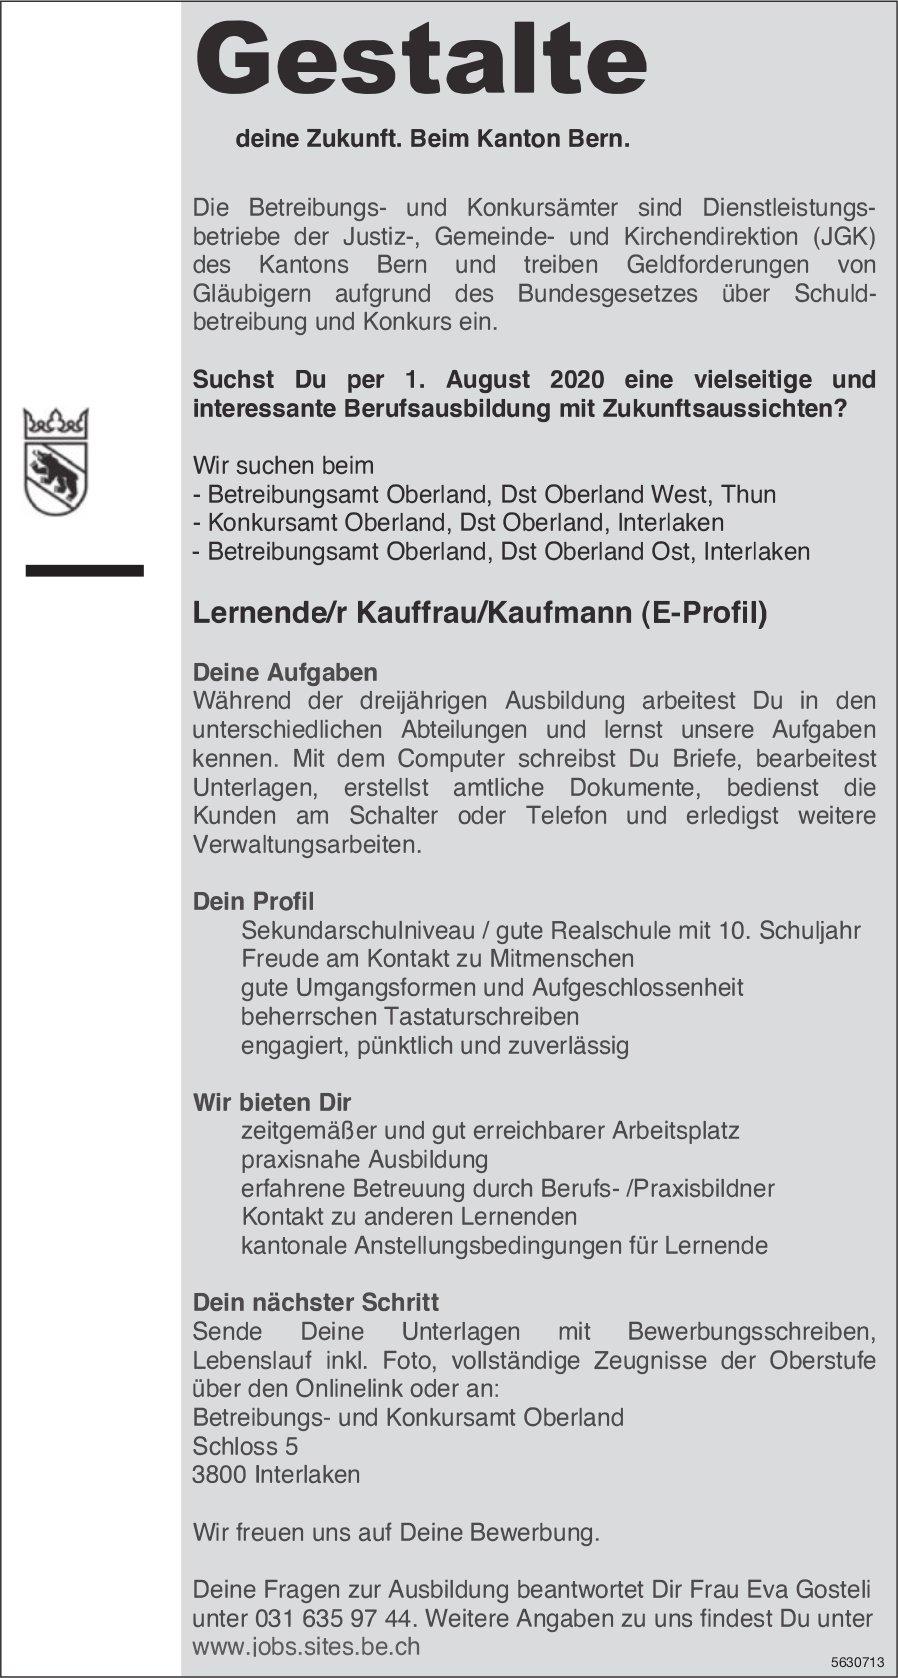 Lernende/r Kauffrau/Kaufmann (E-Profil) bei JGK des Kantons Bern gesucht